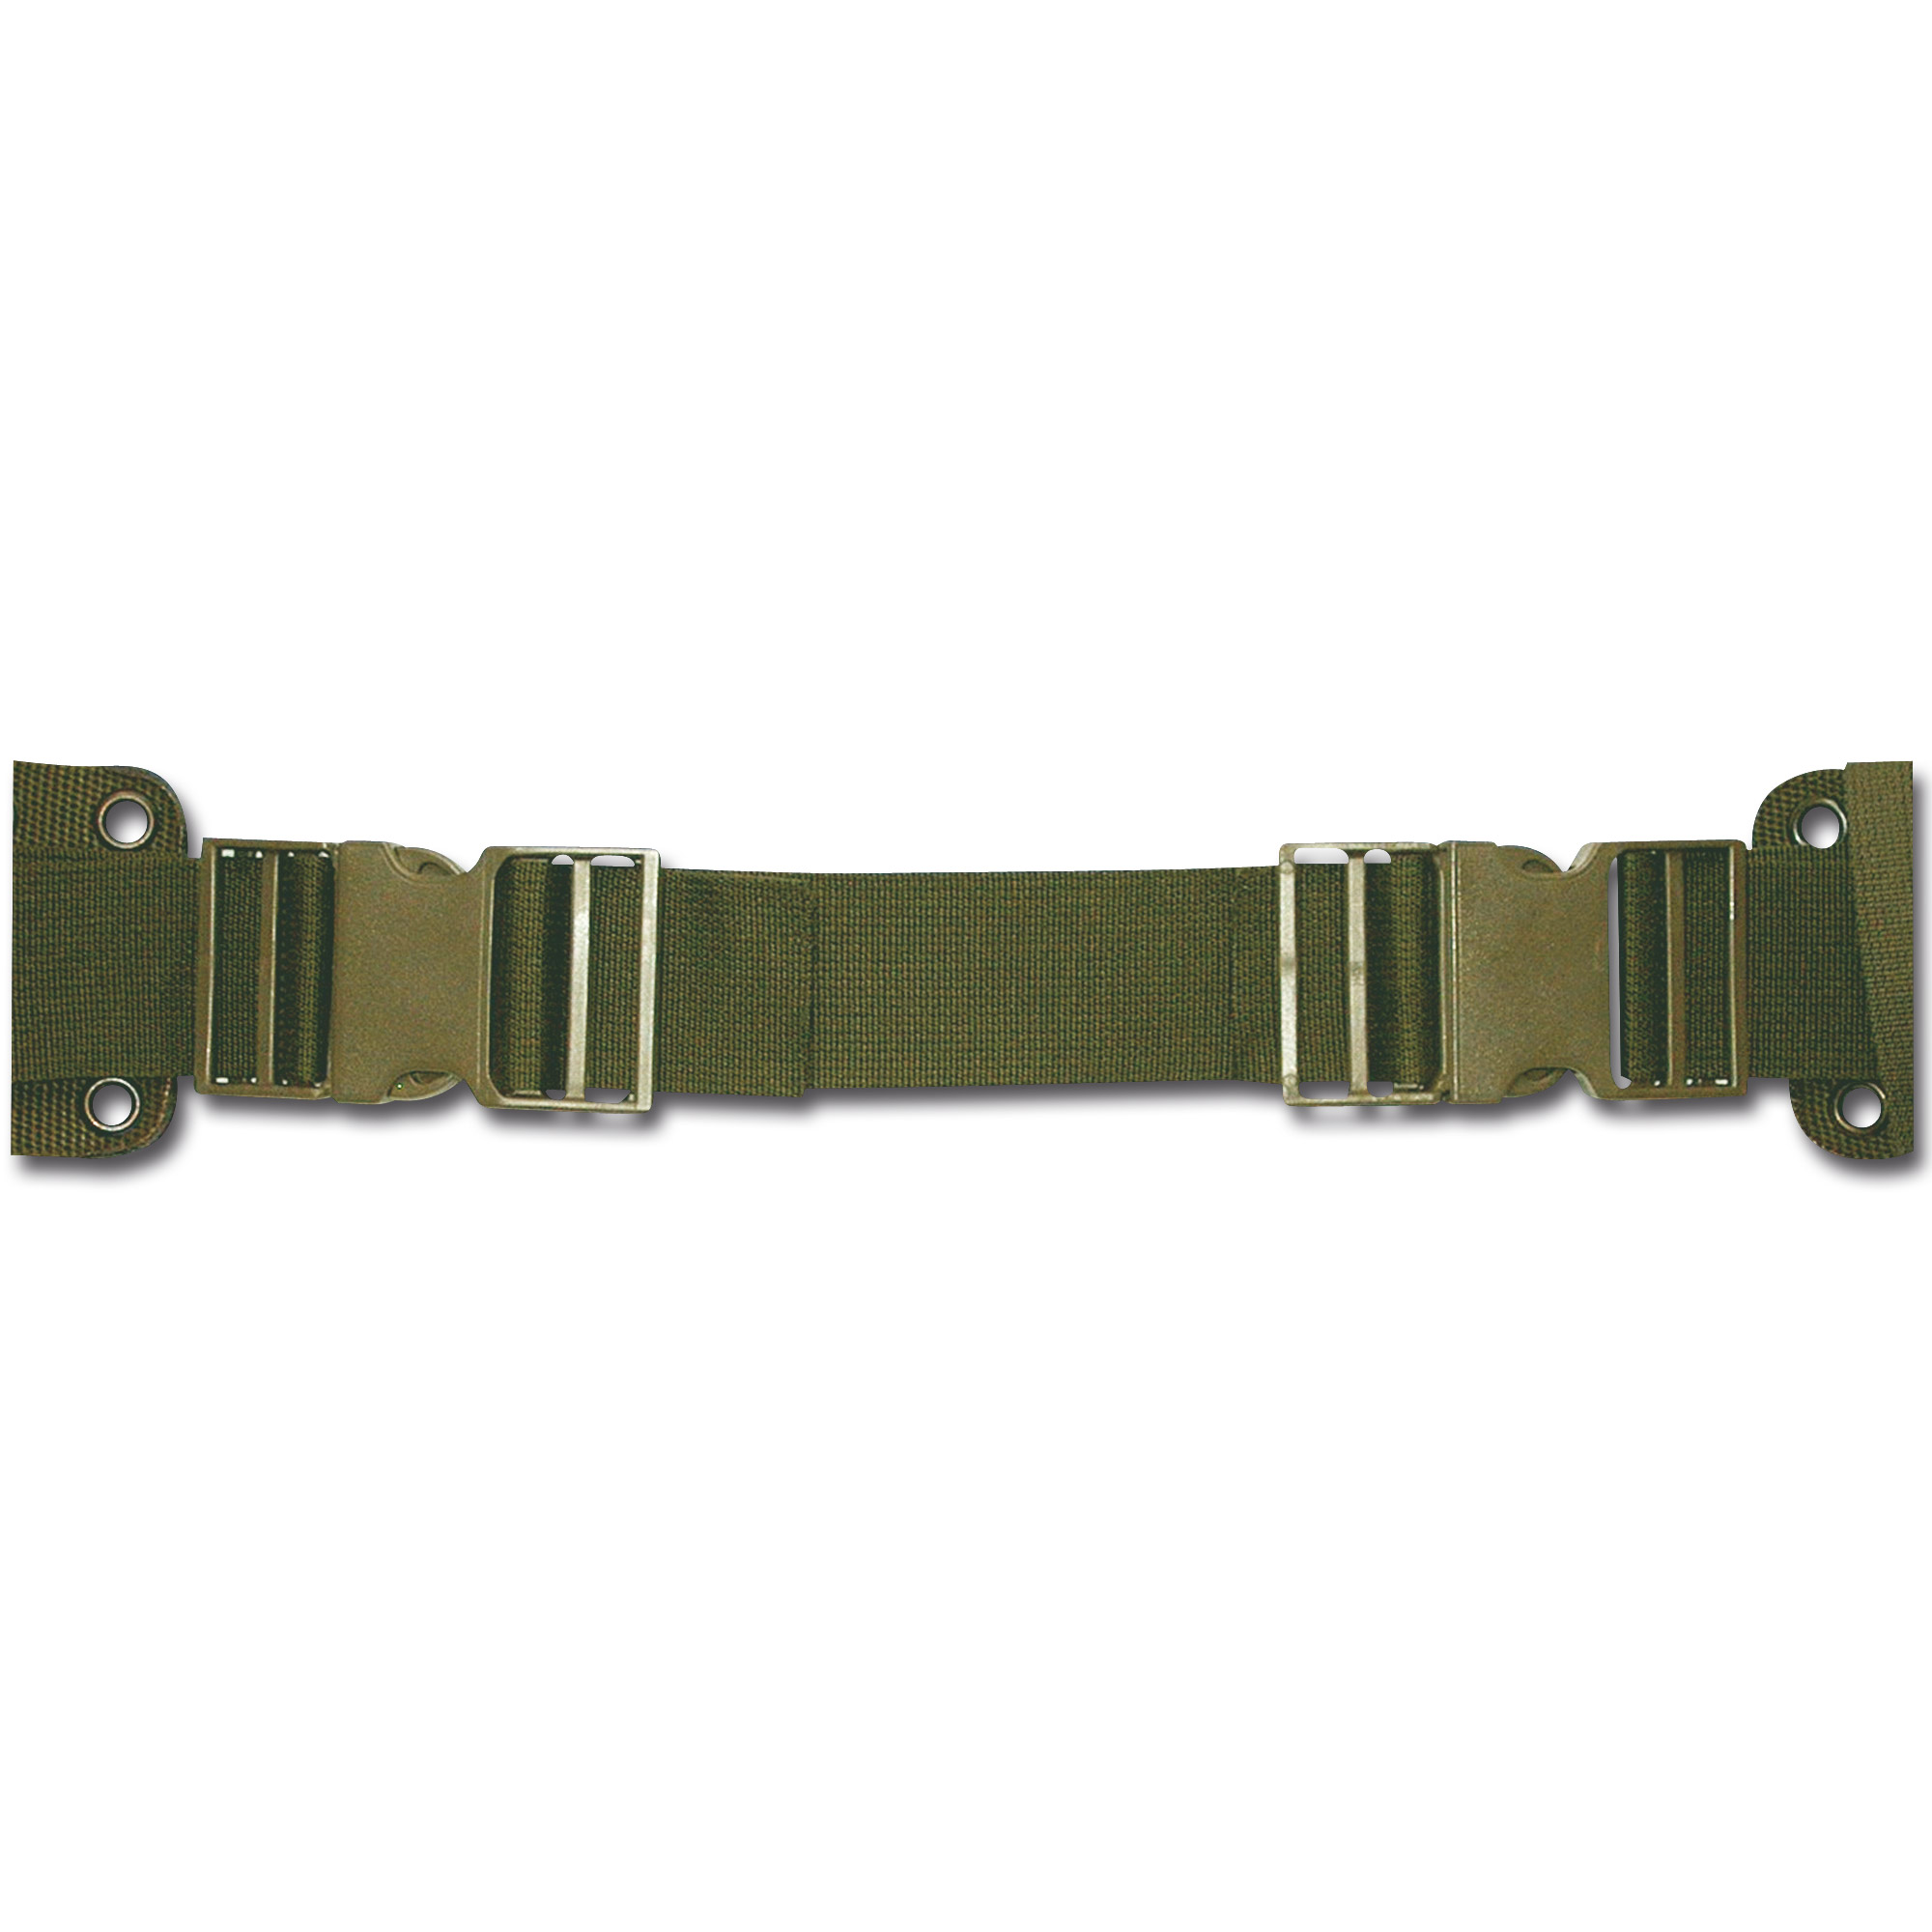 German Military Belt Extender